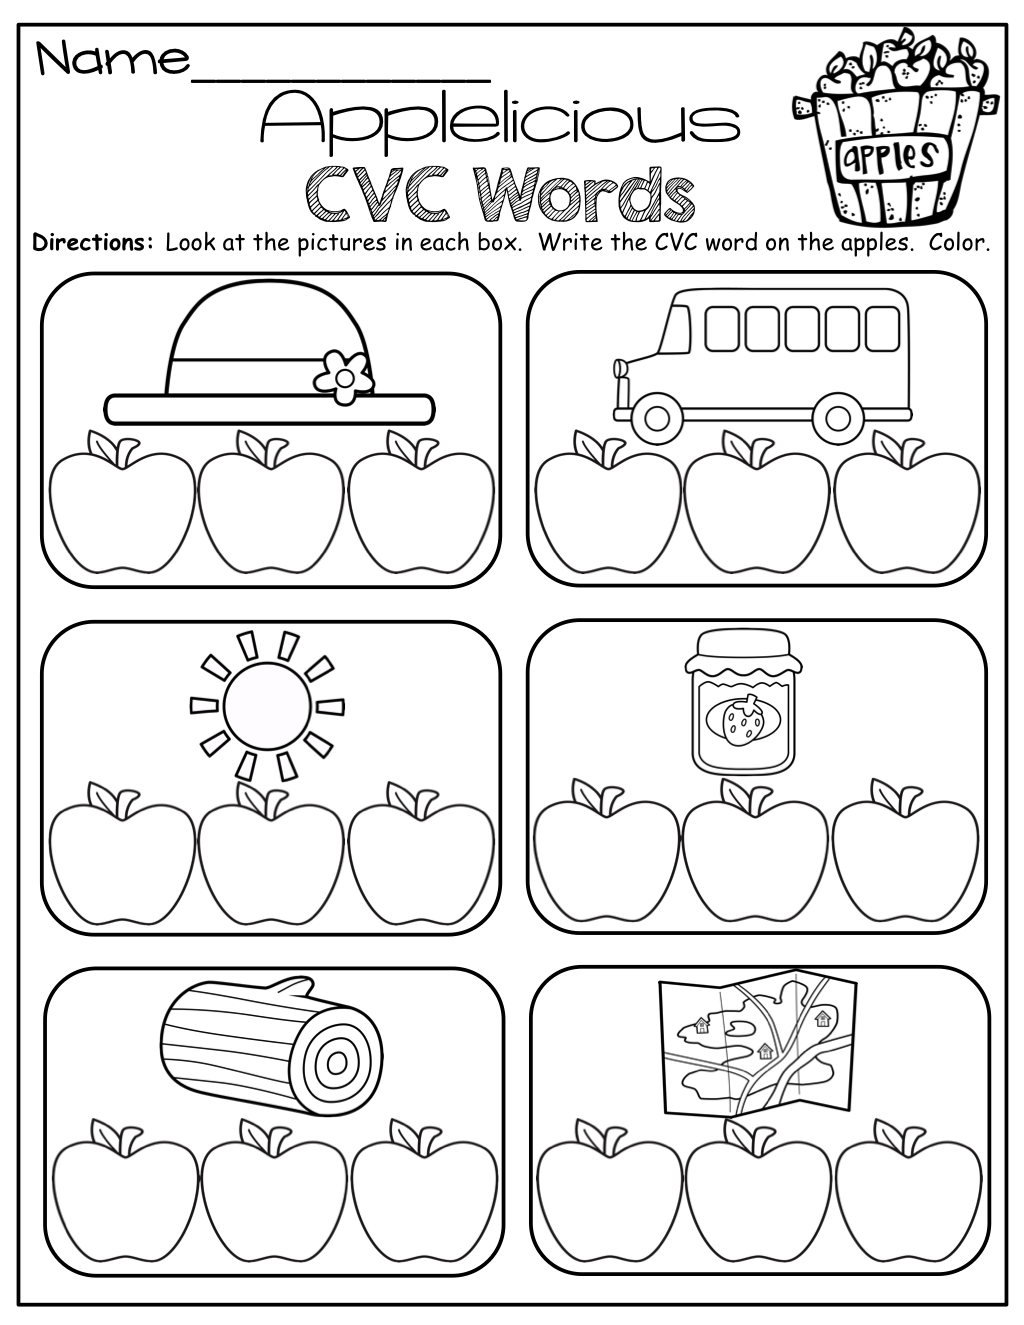 Kindergarten Printable Cvc Words Worksheets